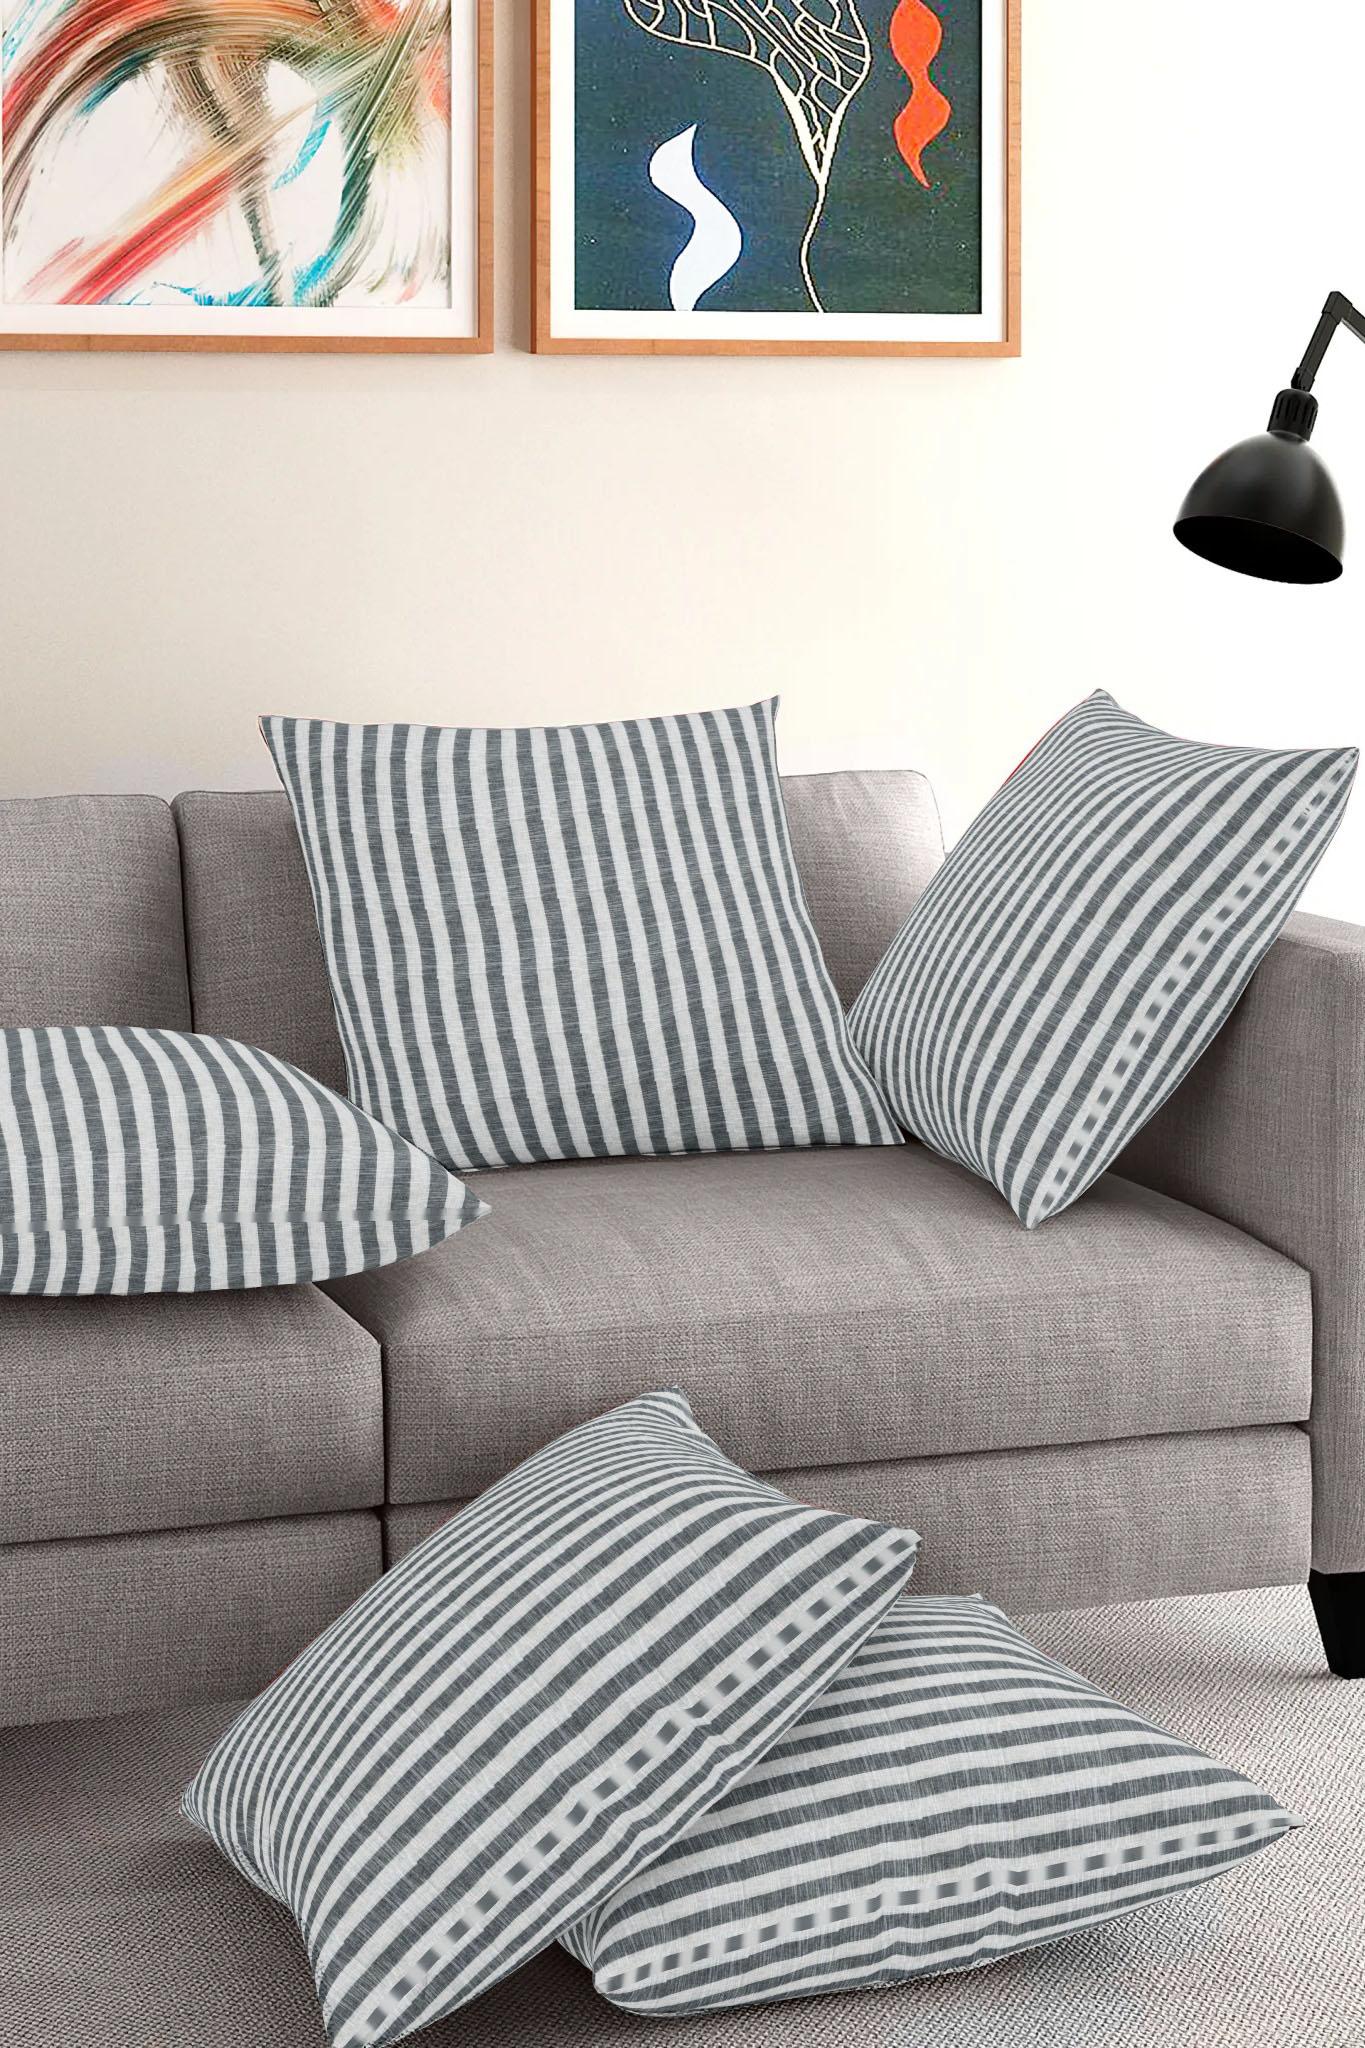 /home/customer/www/fabartcraft.com/public_html/uploadshttps://www.shopolics.com/uploads/images/medium/White-Gray-Cotton-Cushion-Cover-35407.jpg